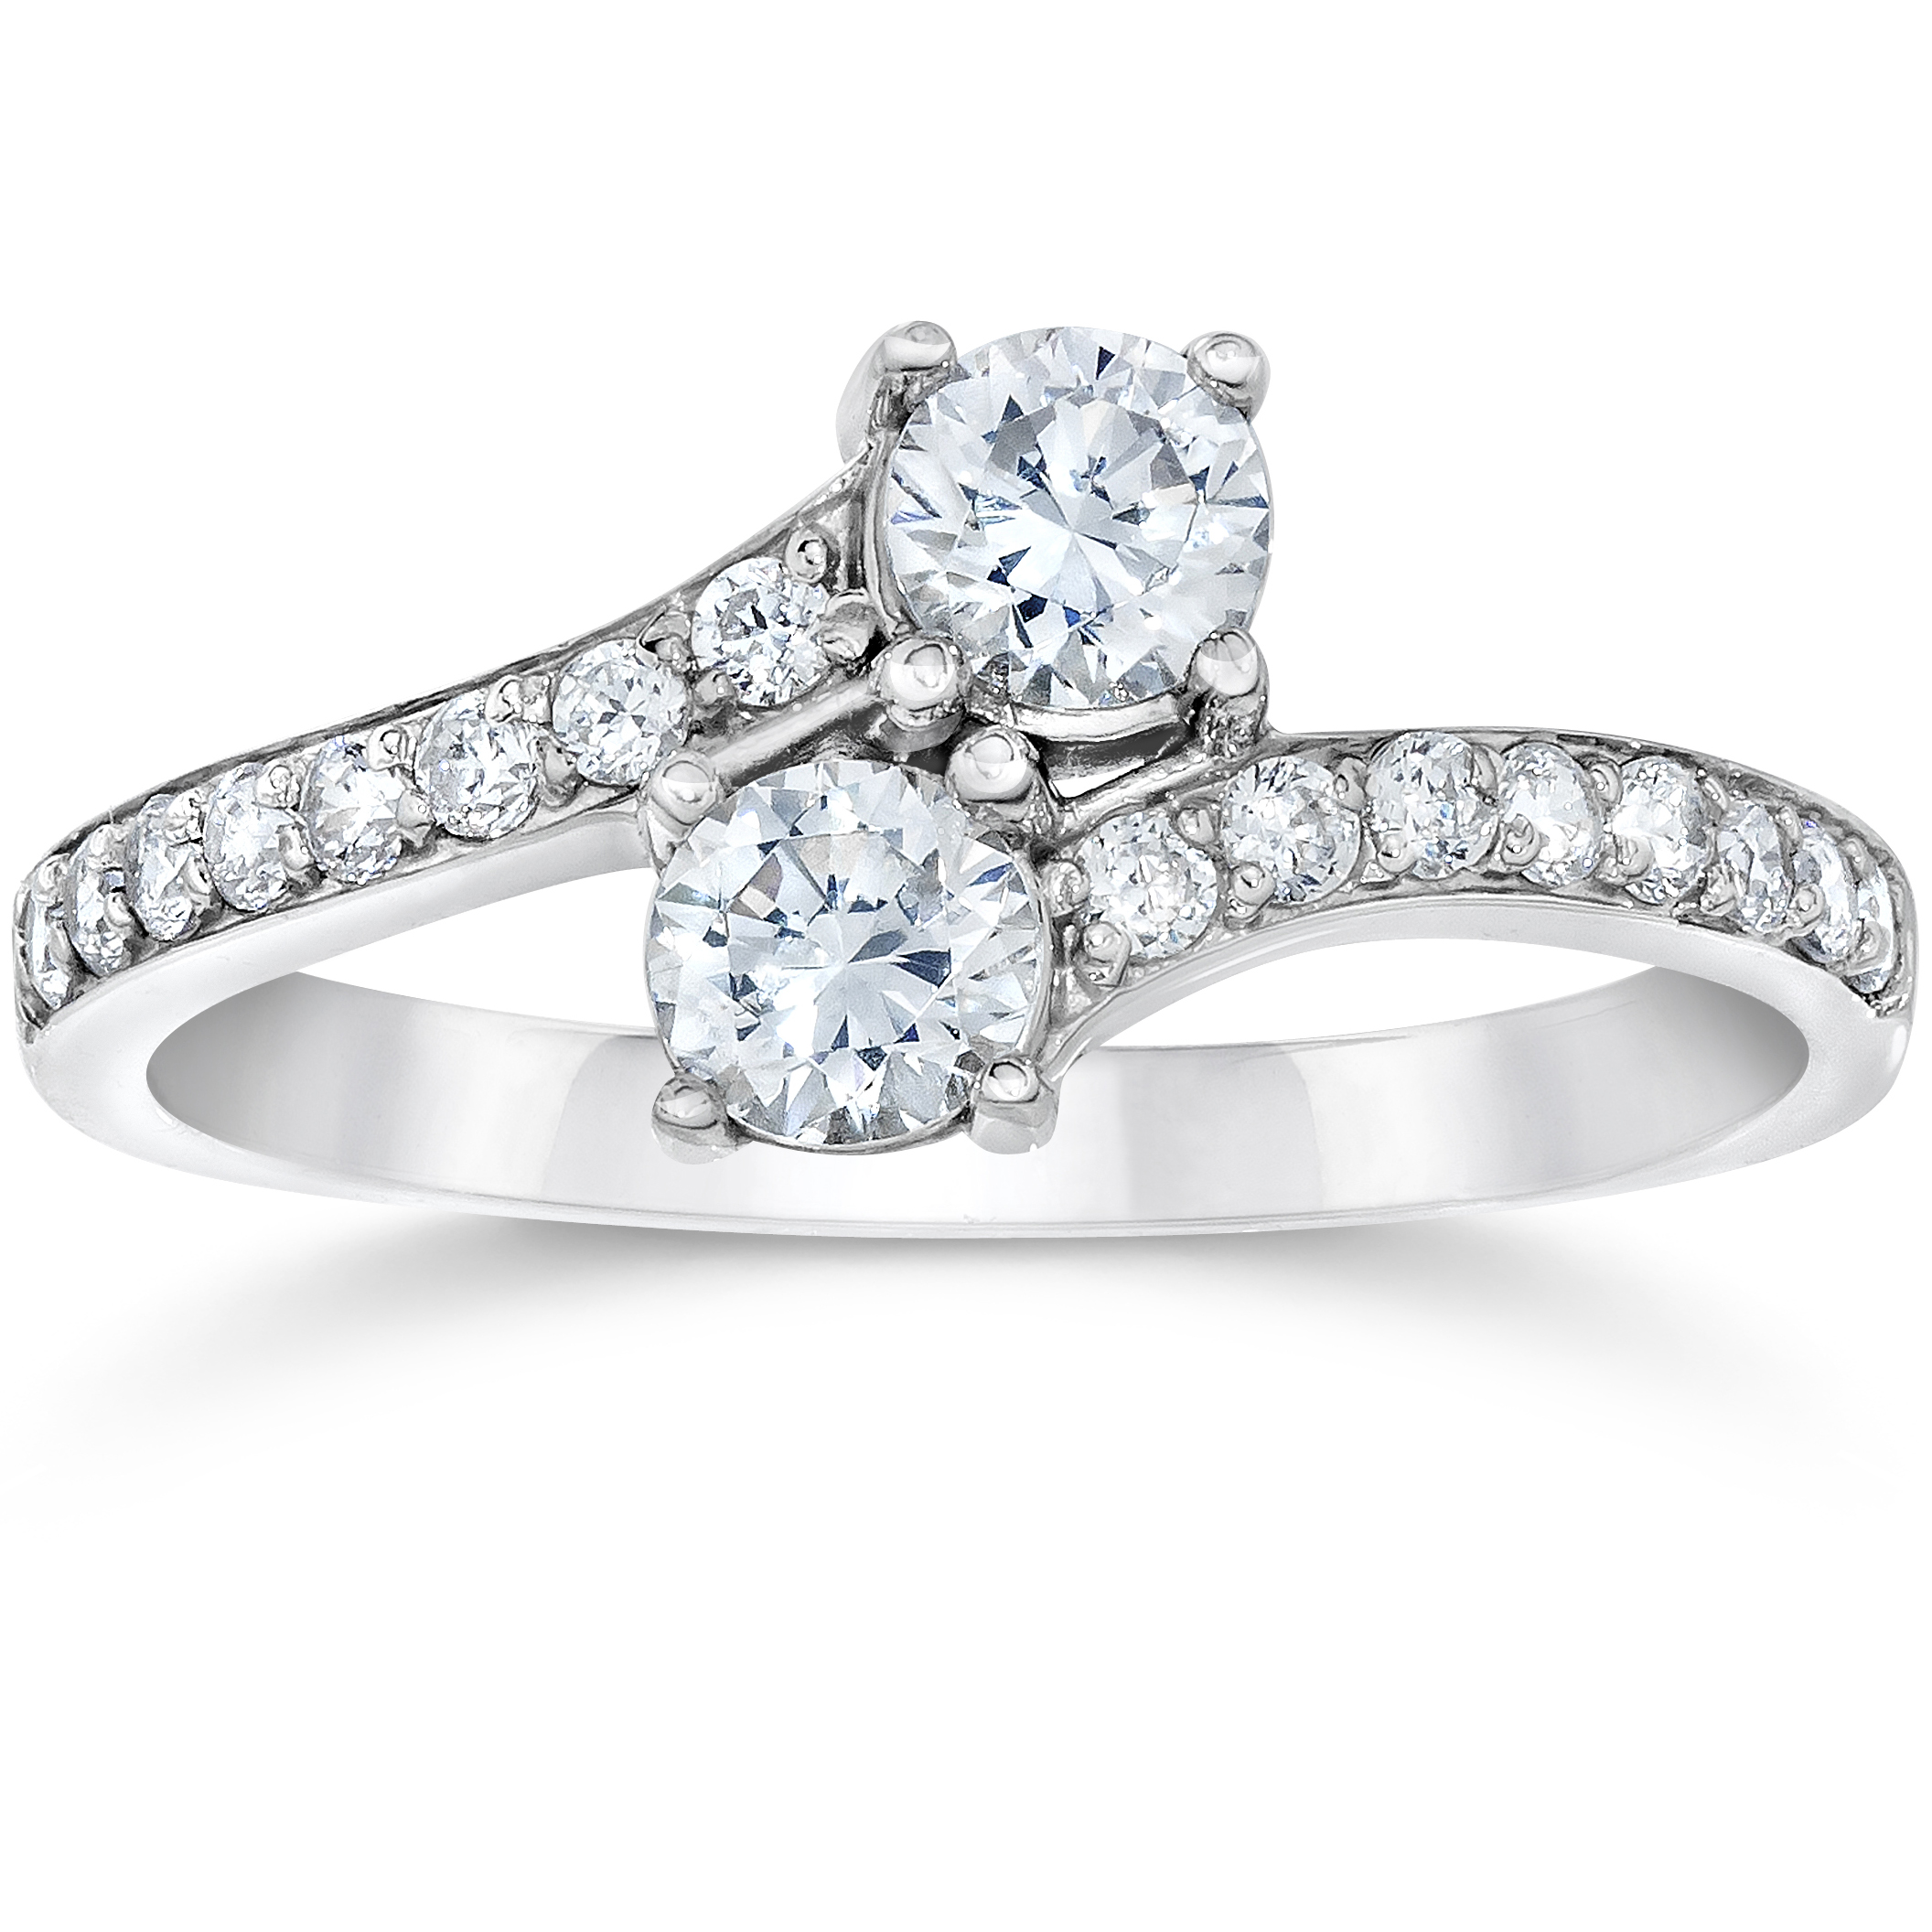 G Vs 1ct 2 Stone Forever Us Lab Grown Diamond Engagement Ring 14k White Gold